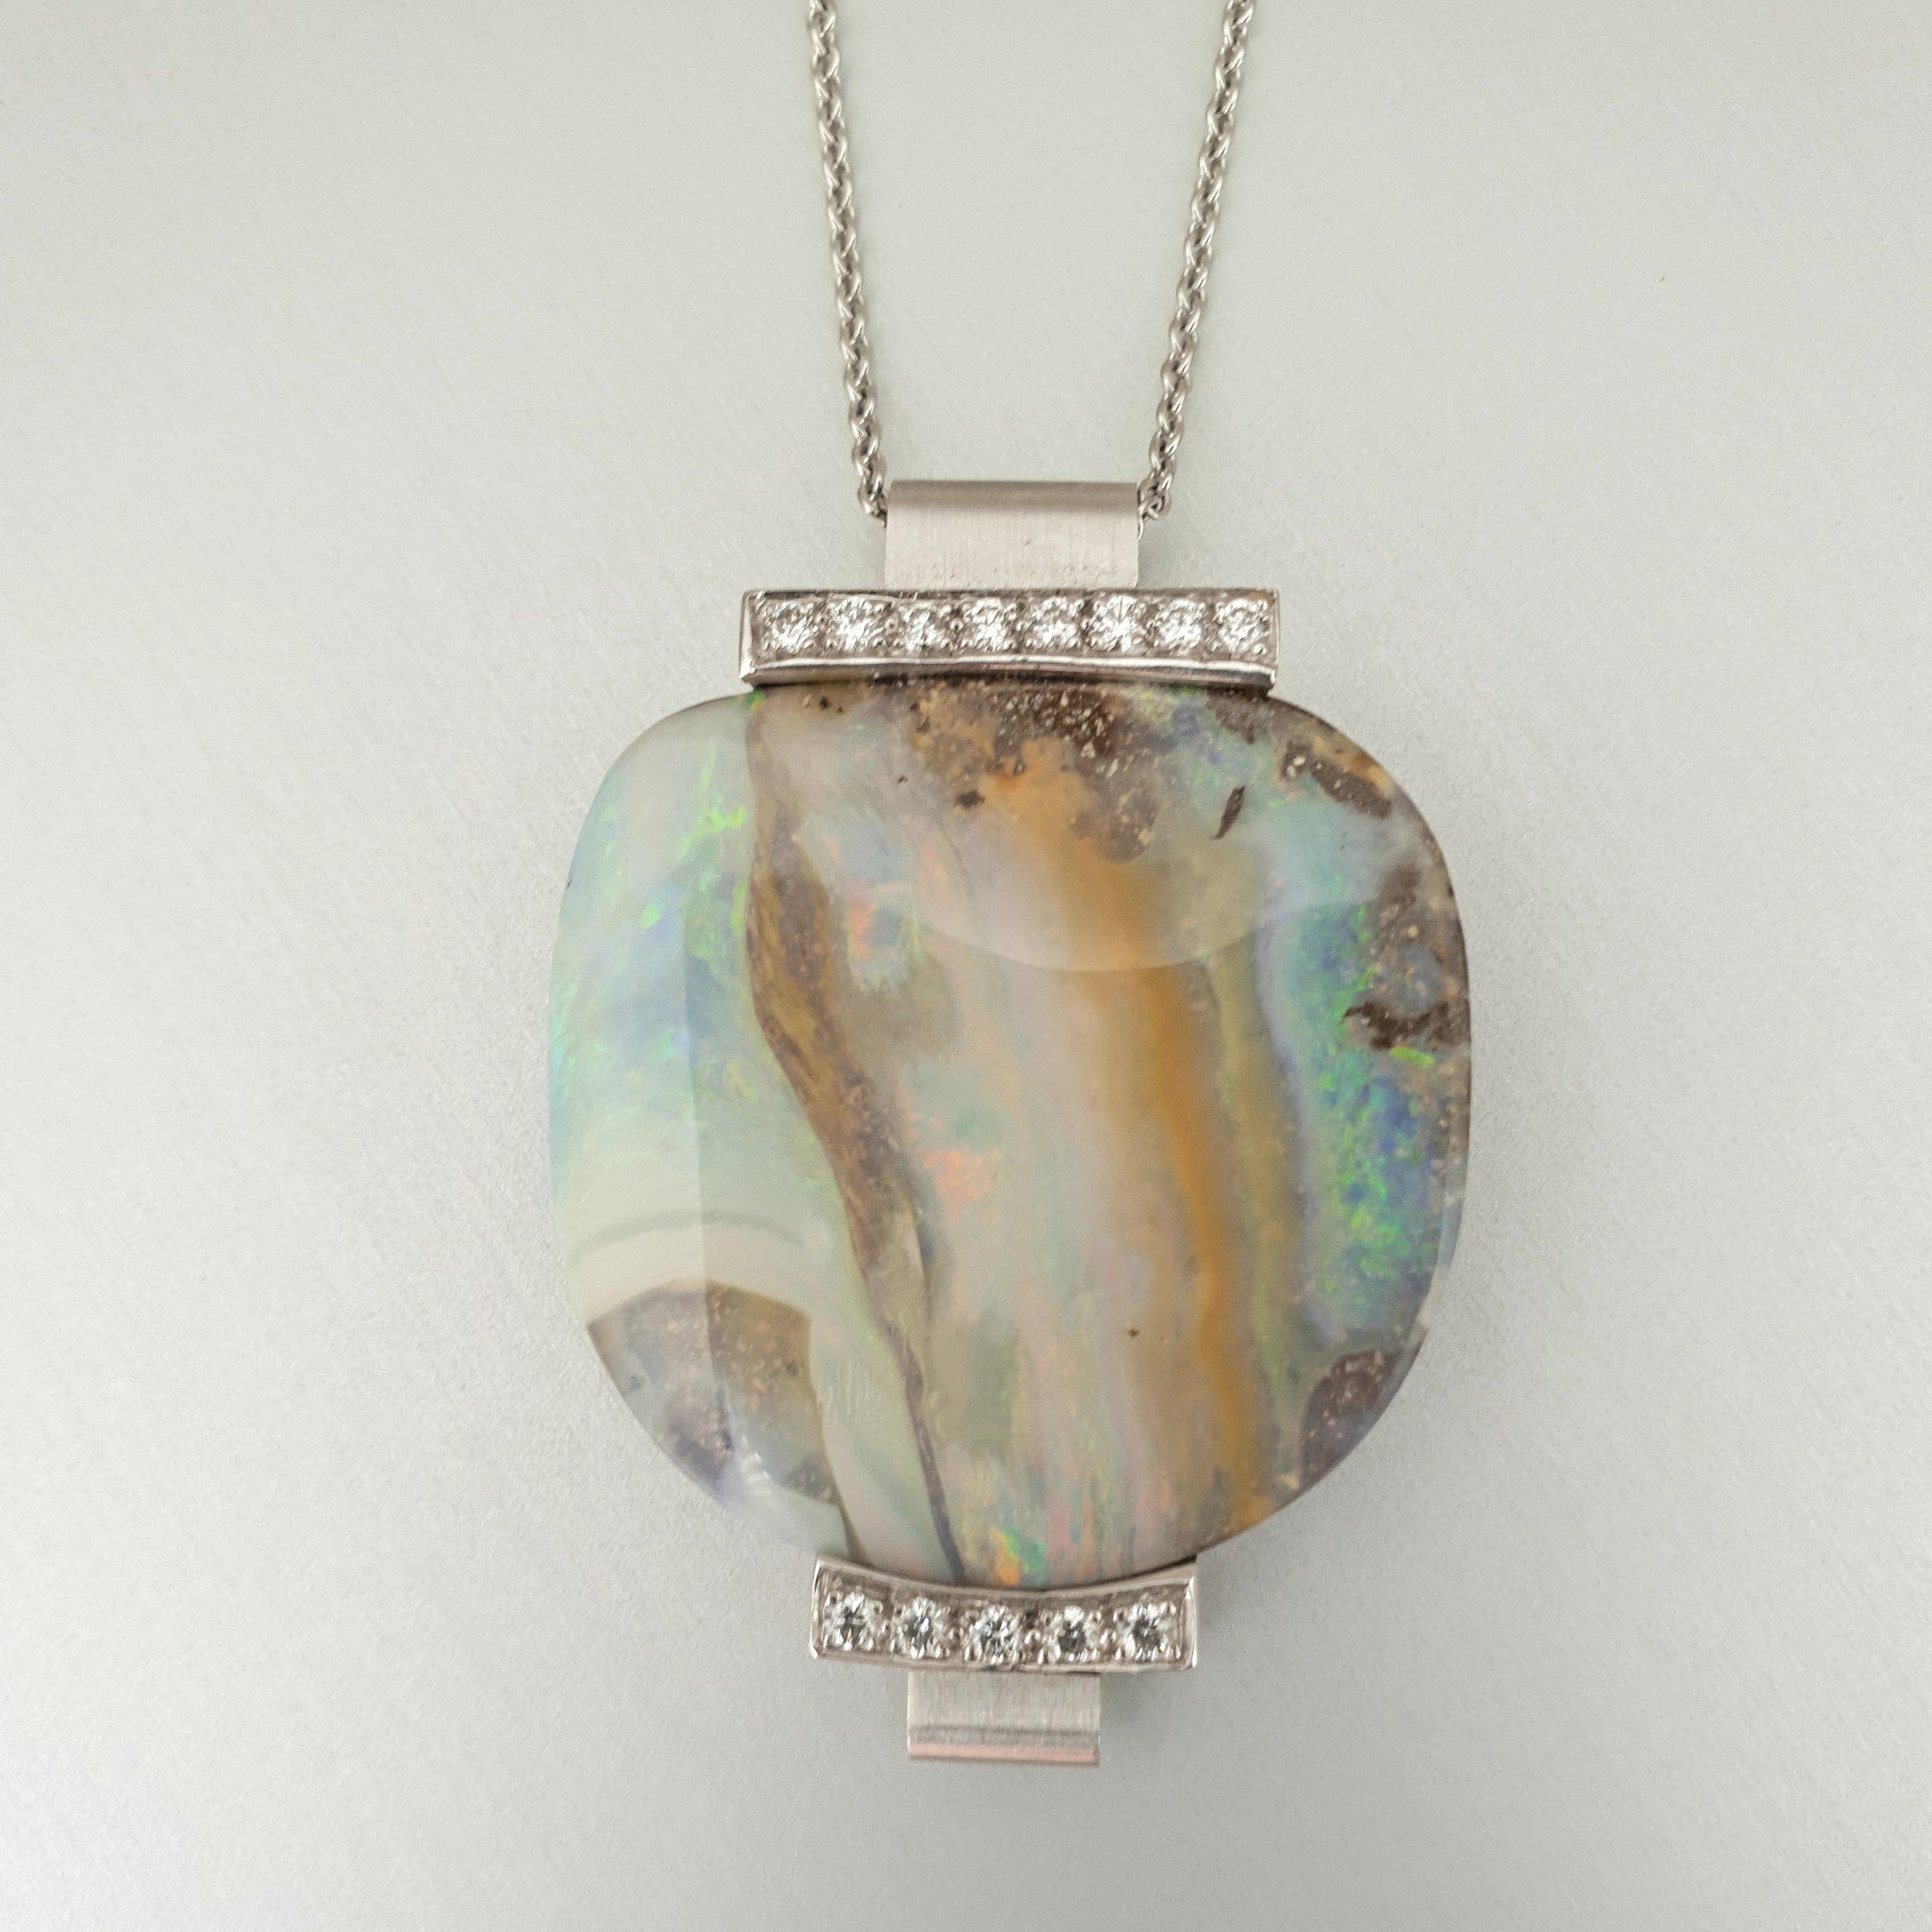 'Krest' Boulder Opal Pendant